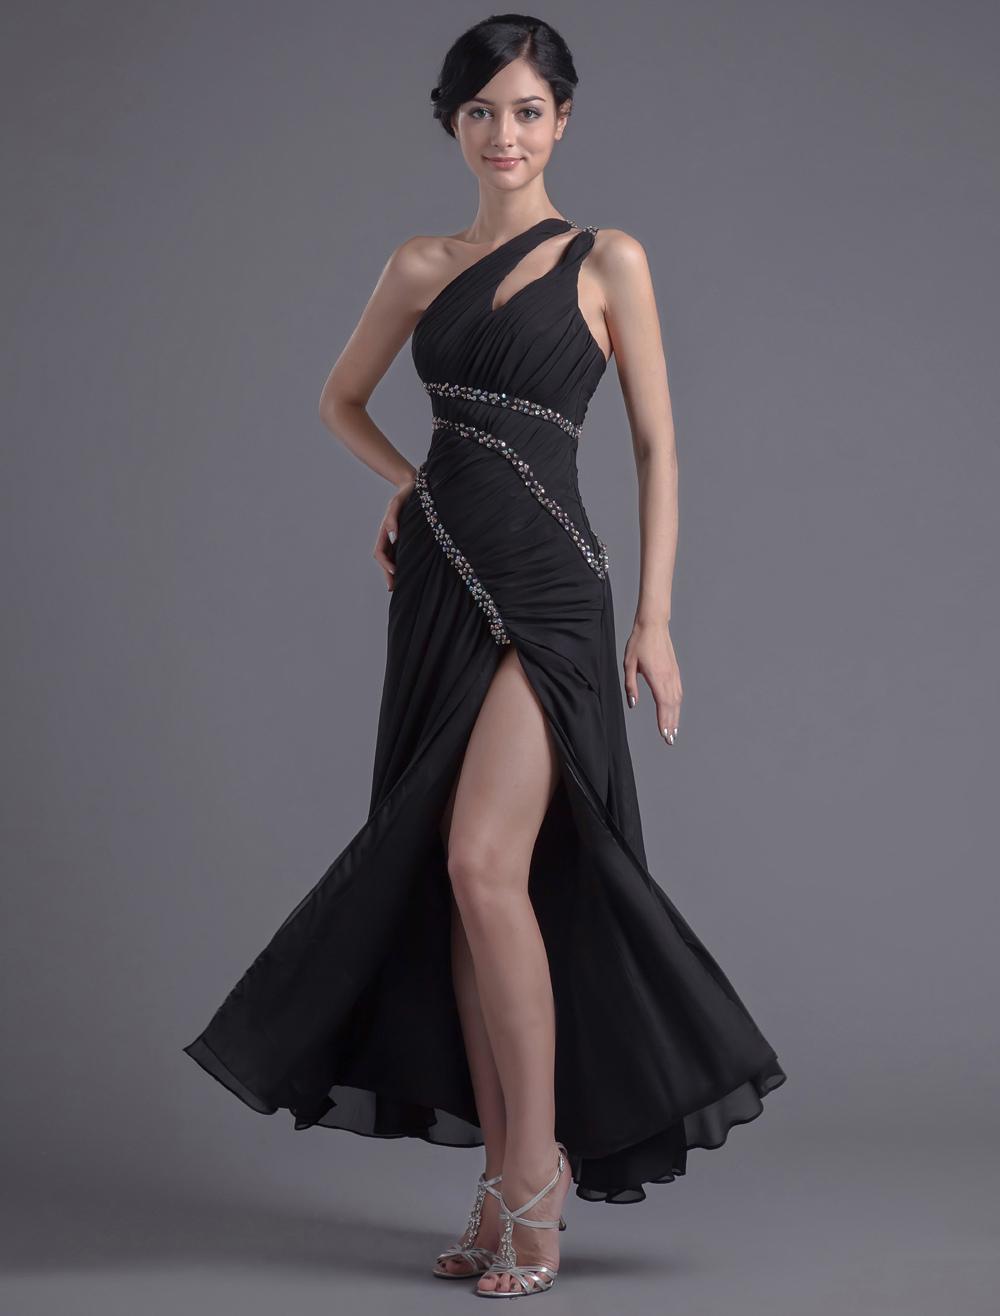 Sheath Black Chiffon Sequin One-Shoulder Ankle-Length Prom Dress (Wedding Prom Dresses) photo